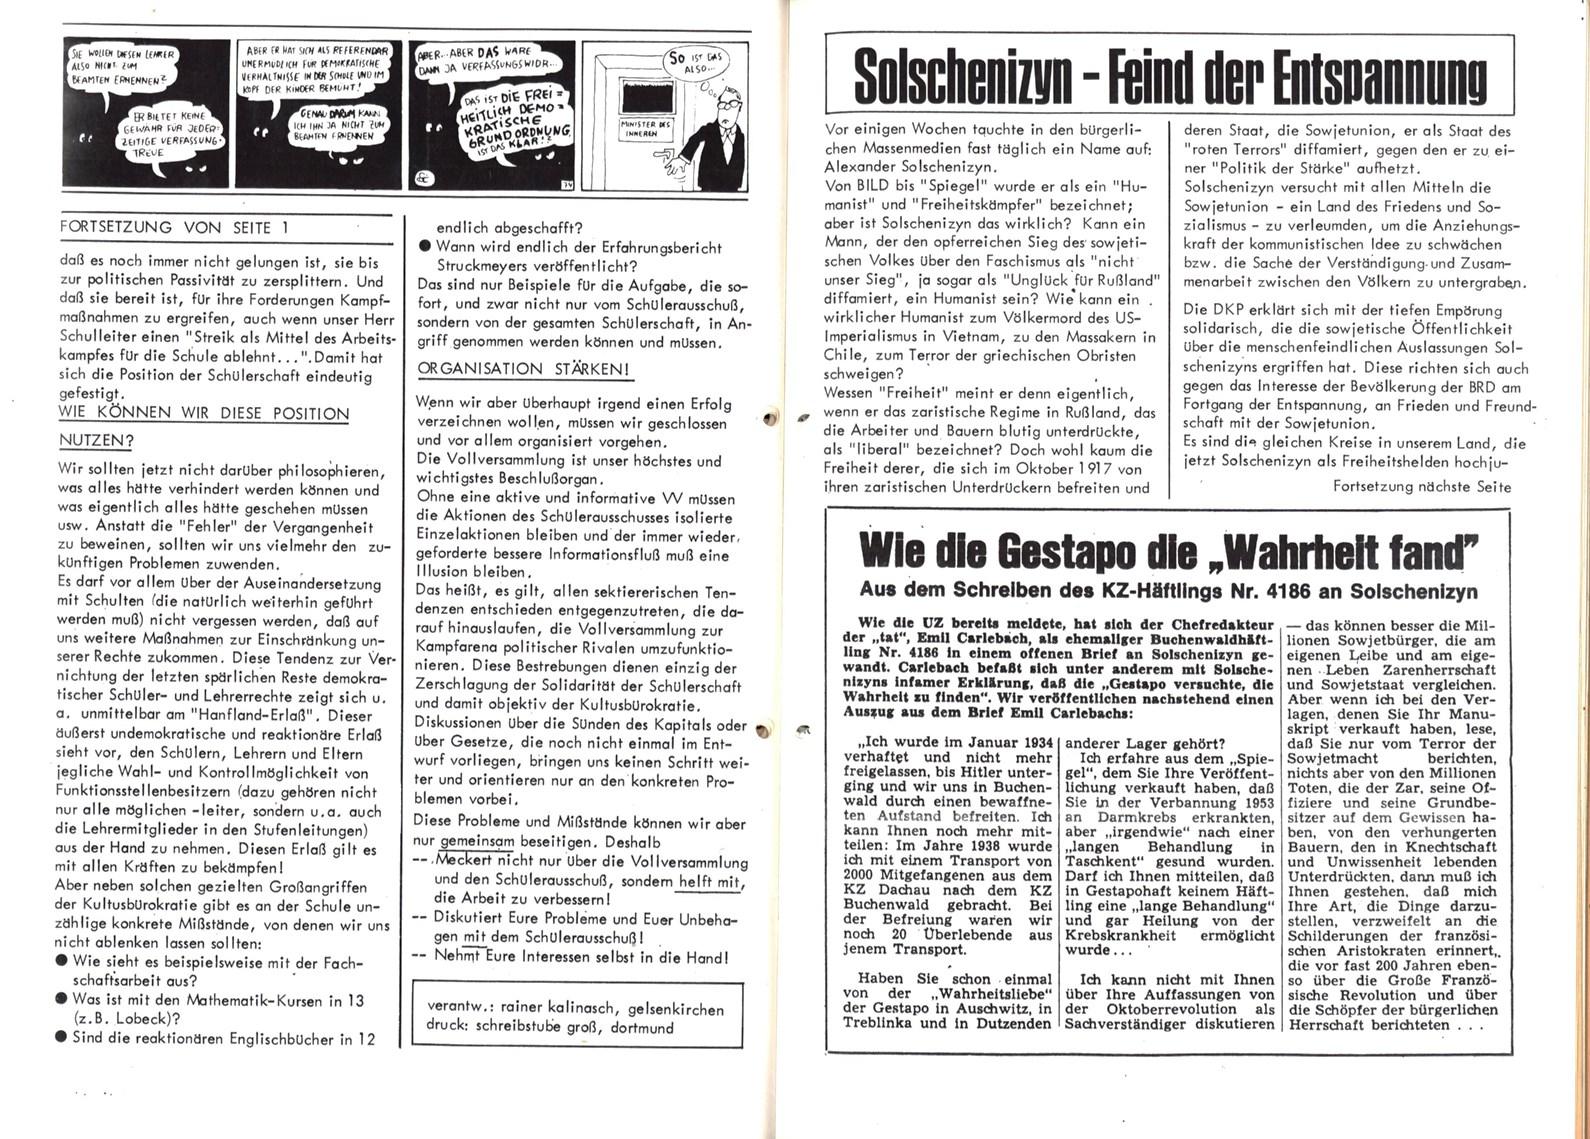 Gelsenkirchen_DKP_Manifest_19740300_02